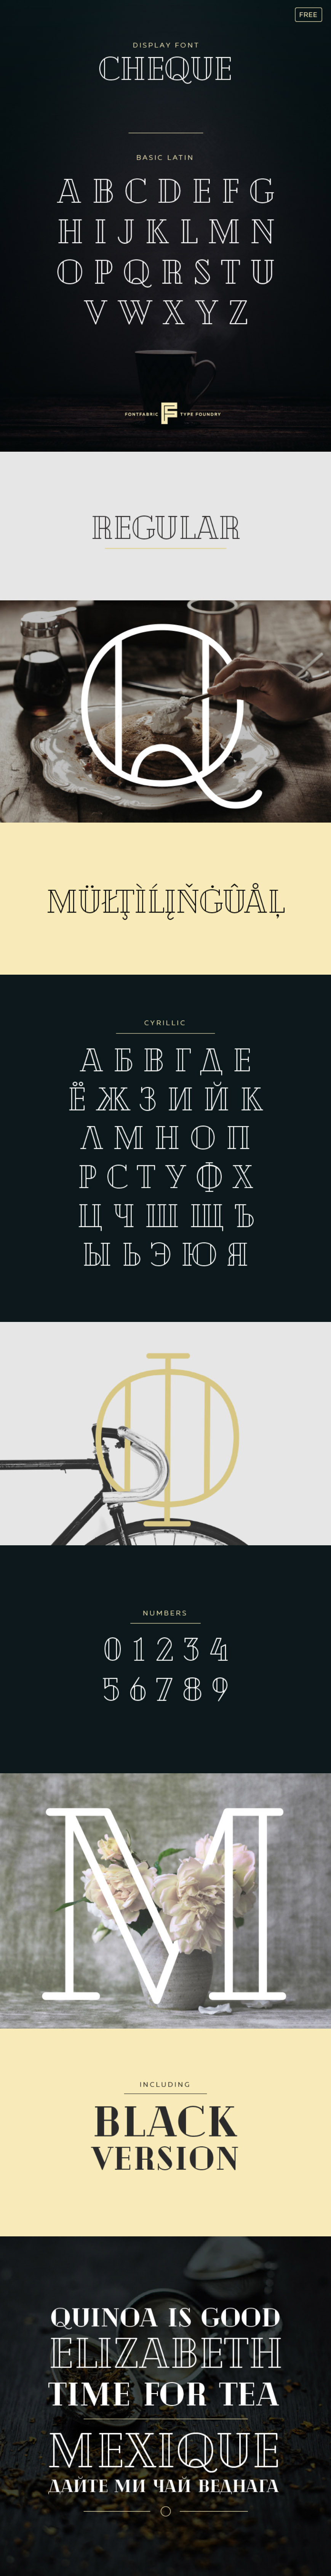 Cheque font - Fontfabric